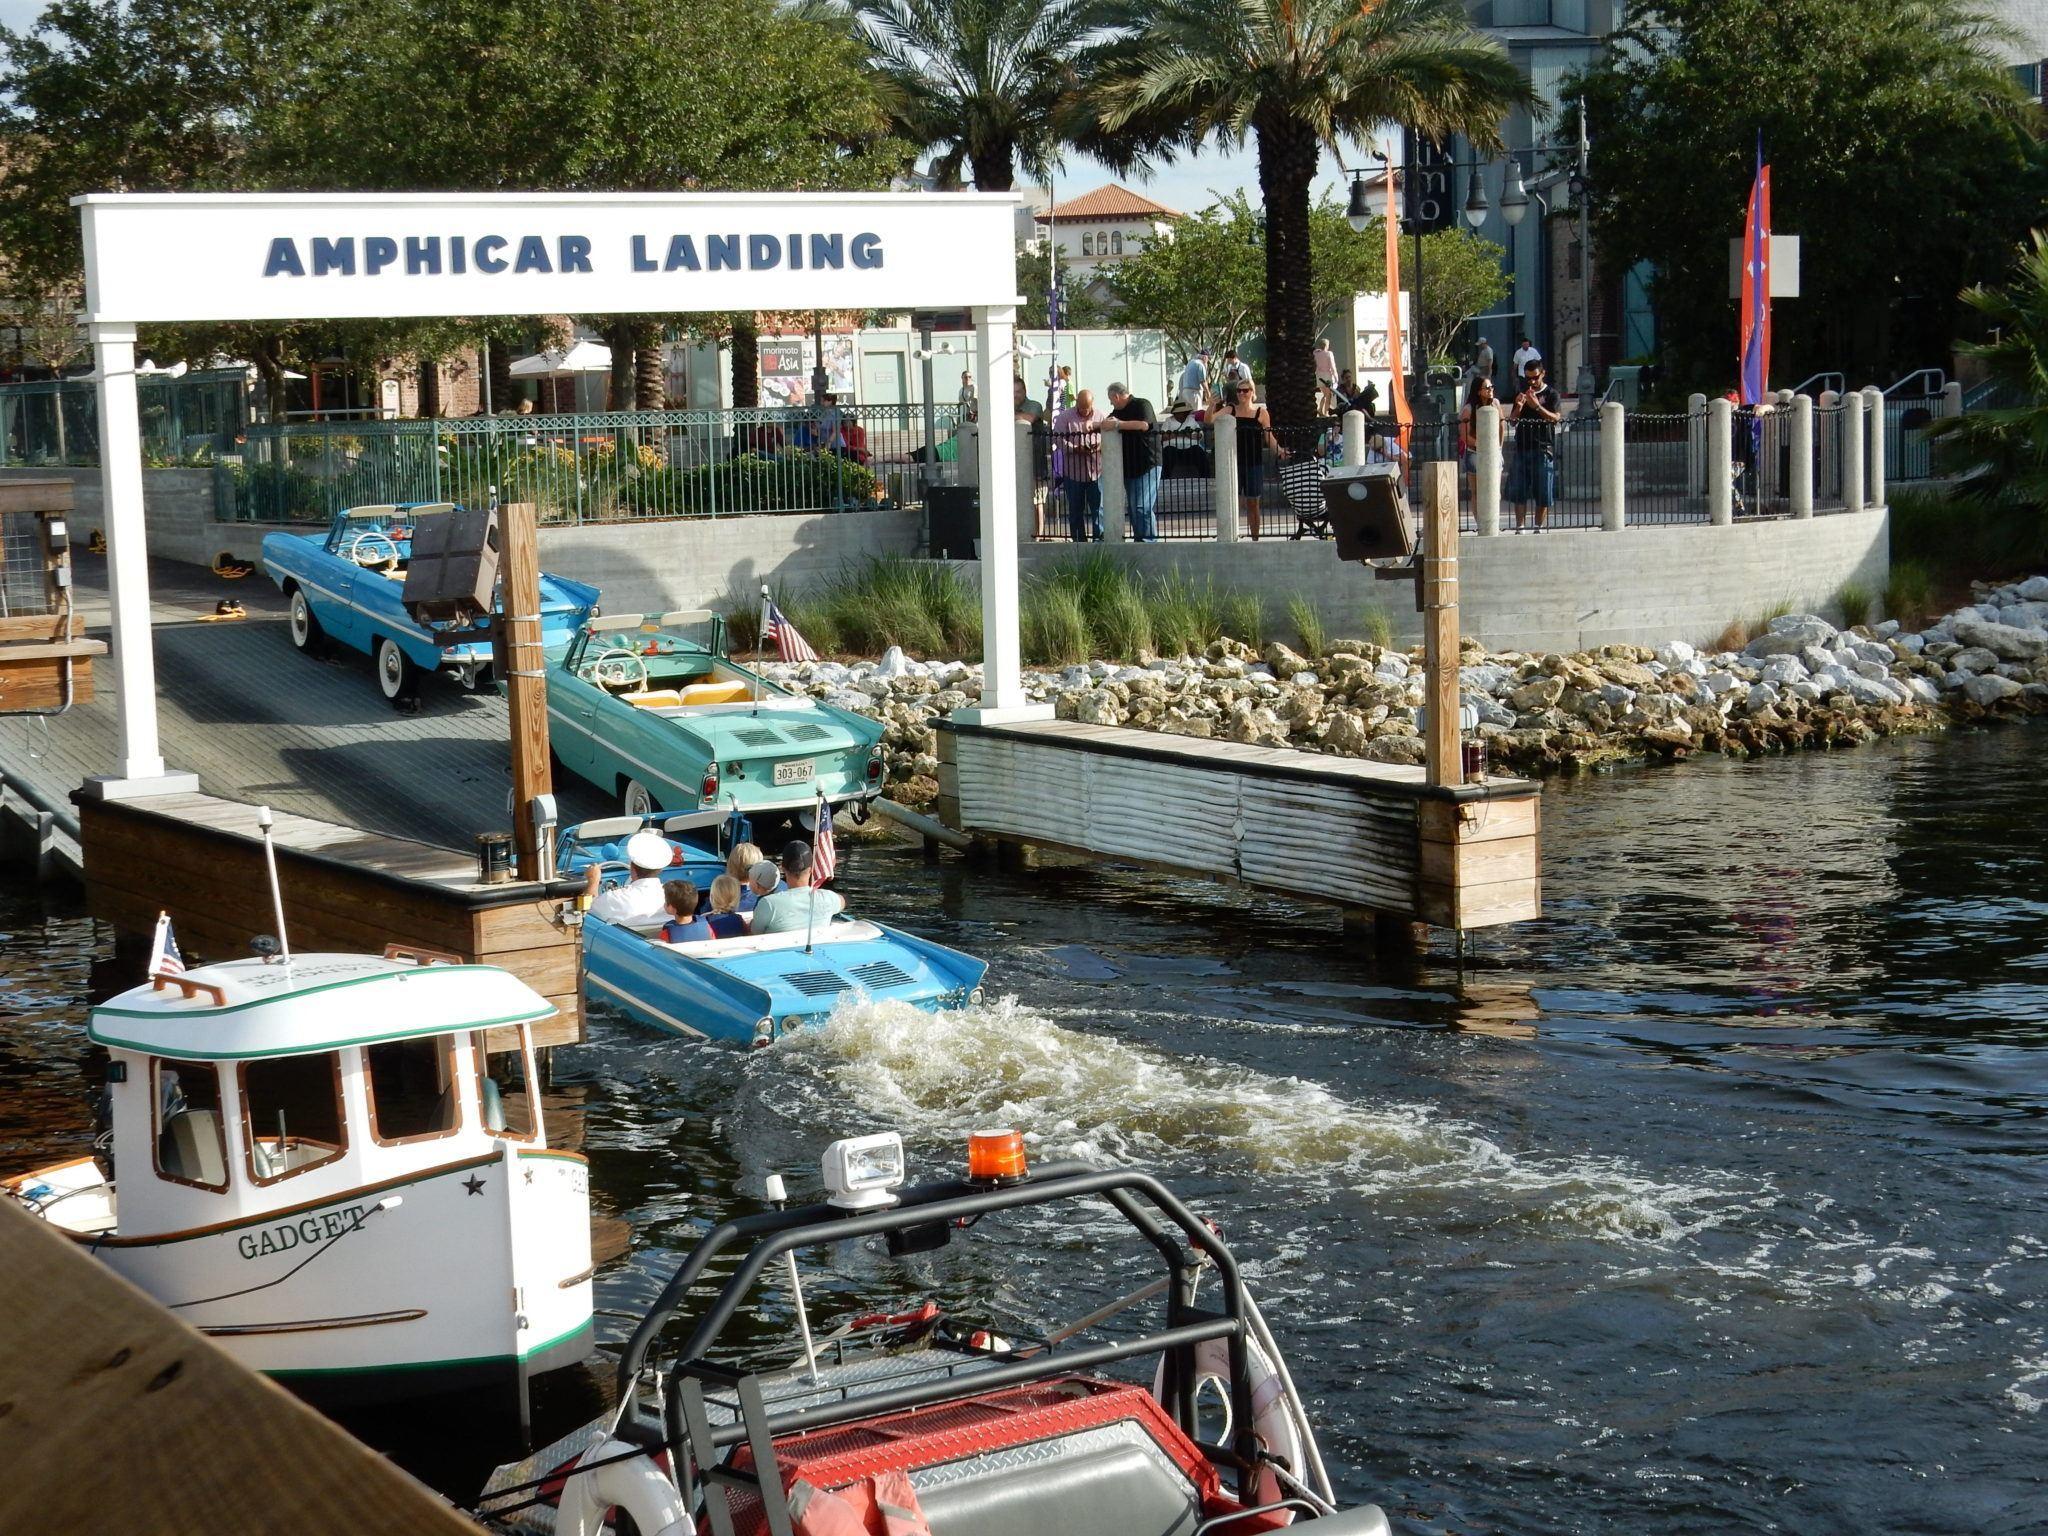 Amphicars at Boathouse Restaurant. Image by Ella Buchan